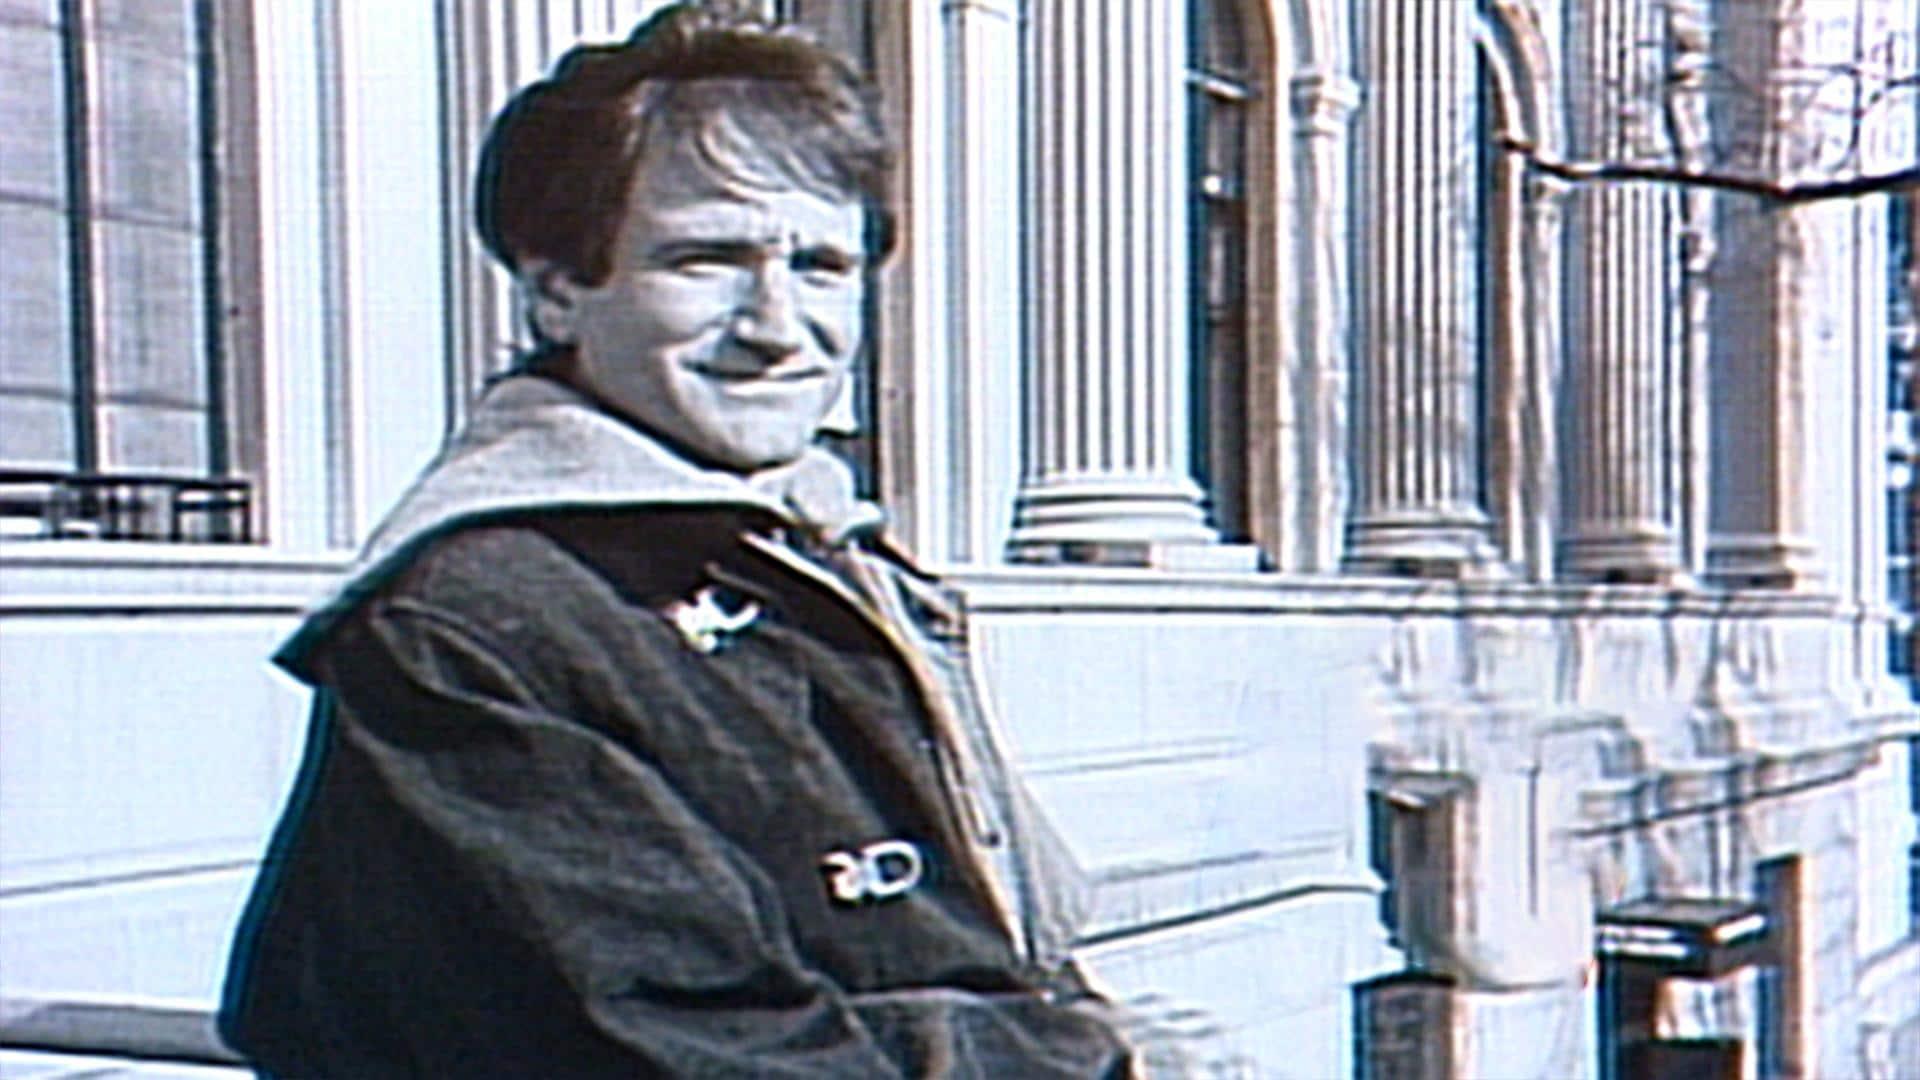 Robin Williams: February 11, 1984